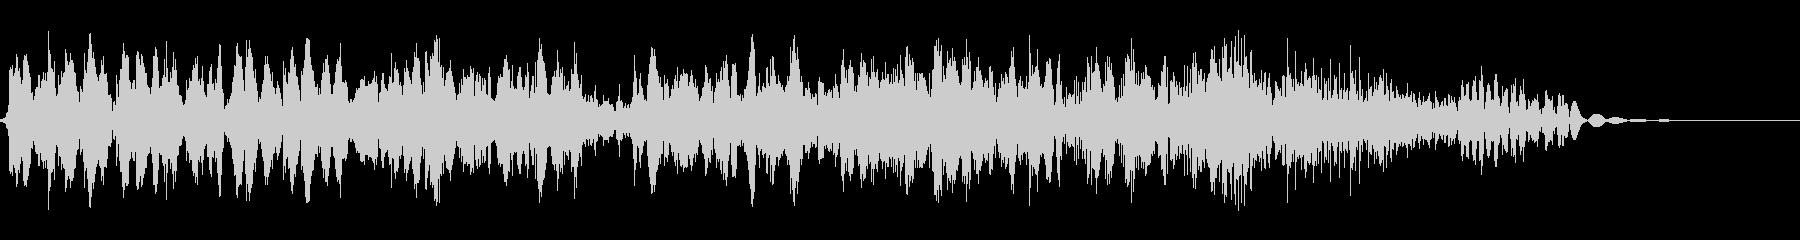 EC04_38_4を巻き戻すの未再生の波形